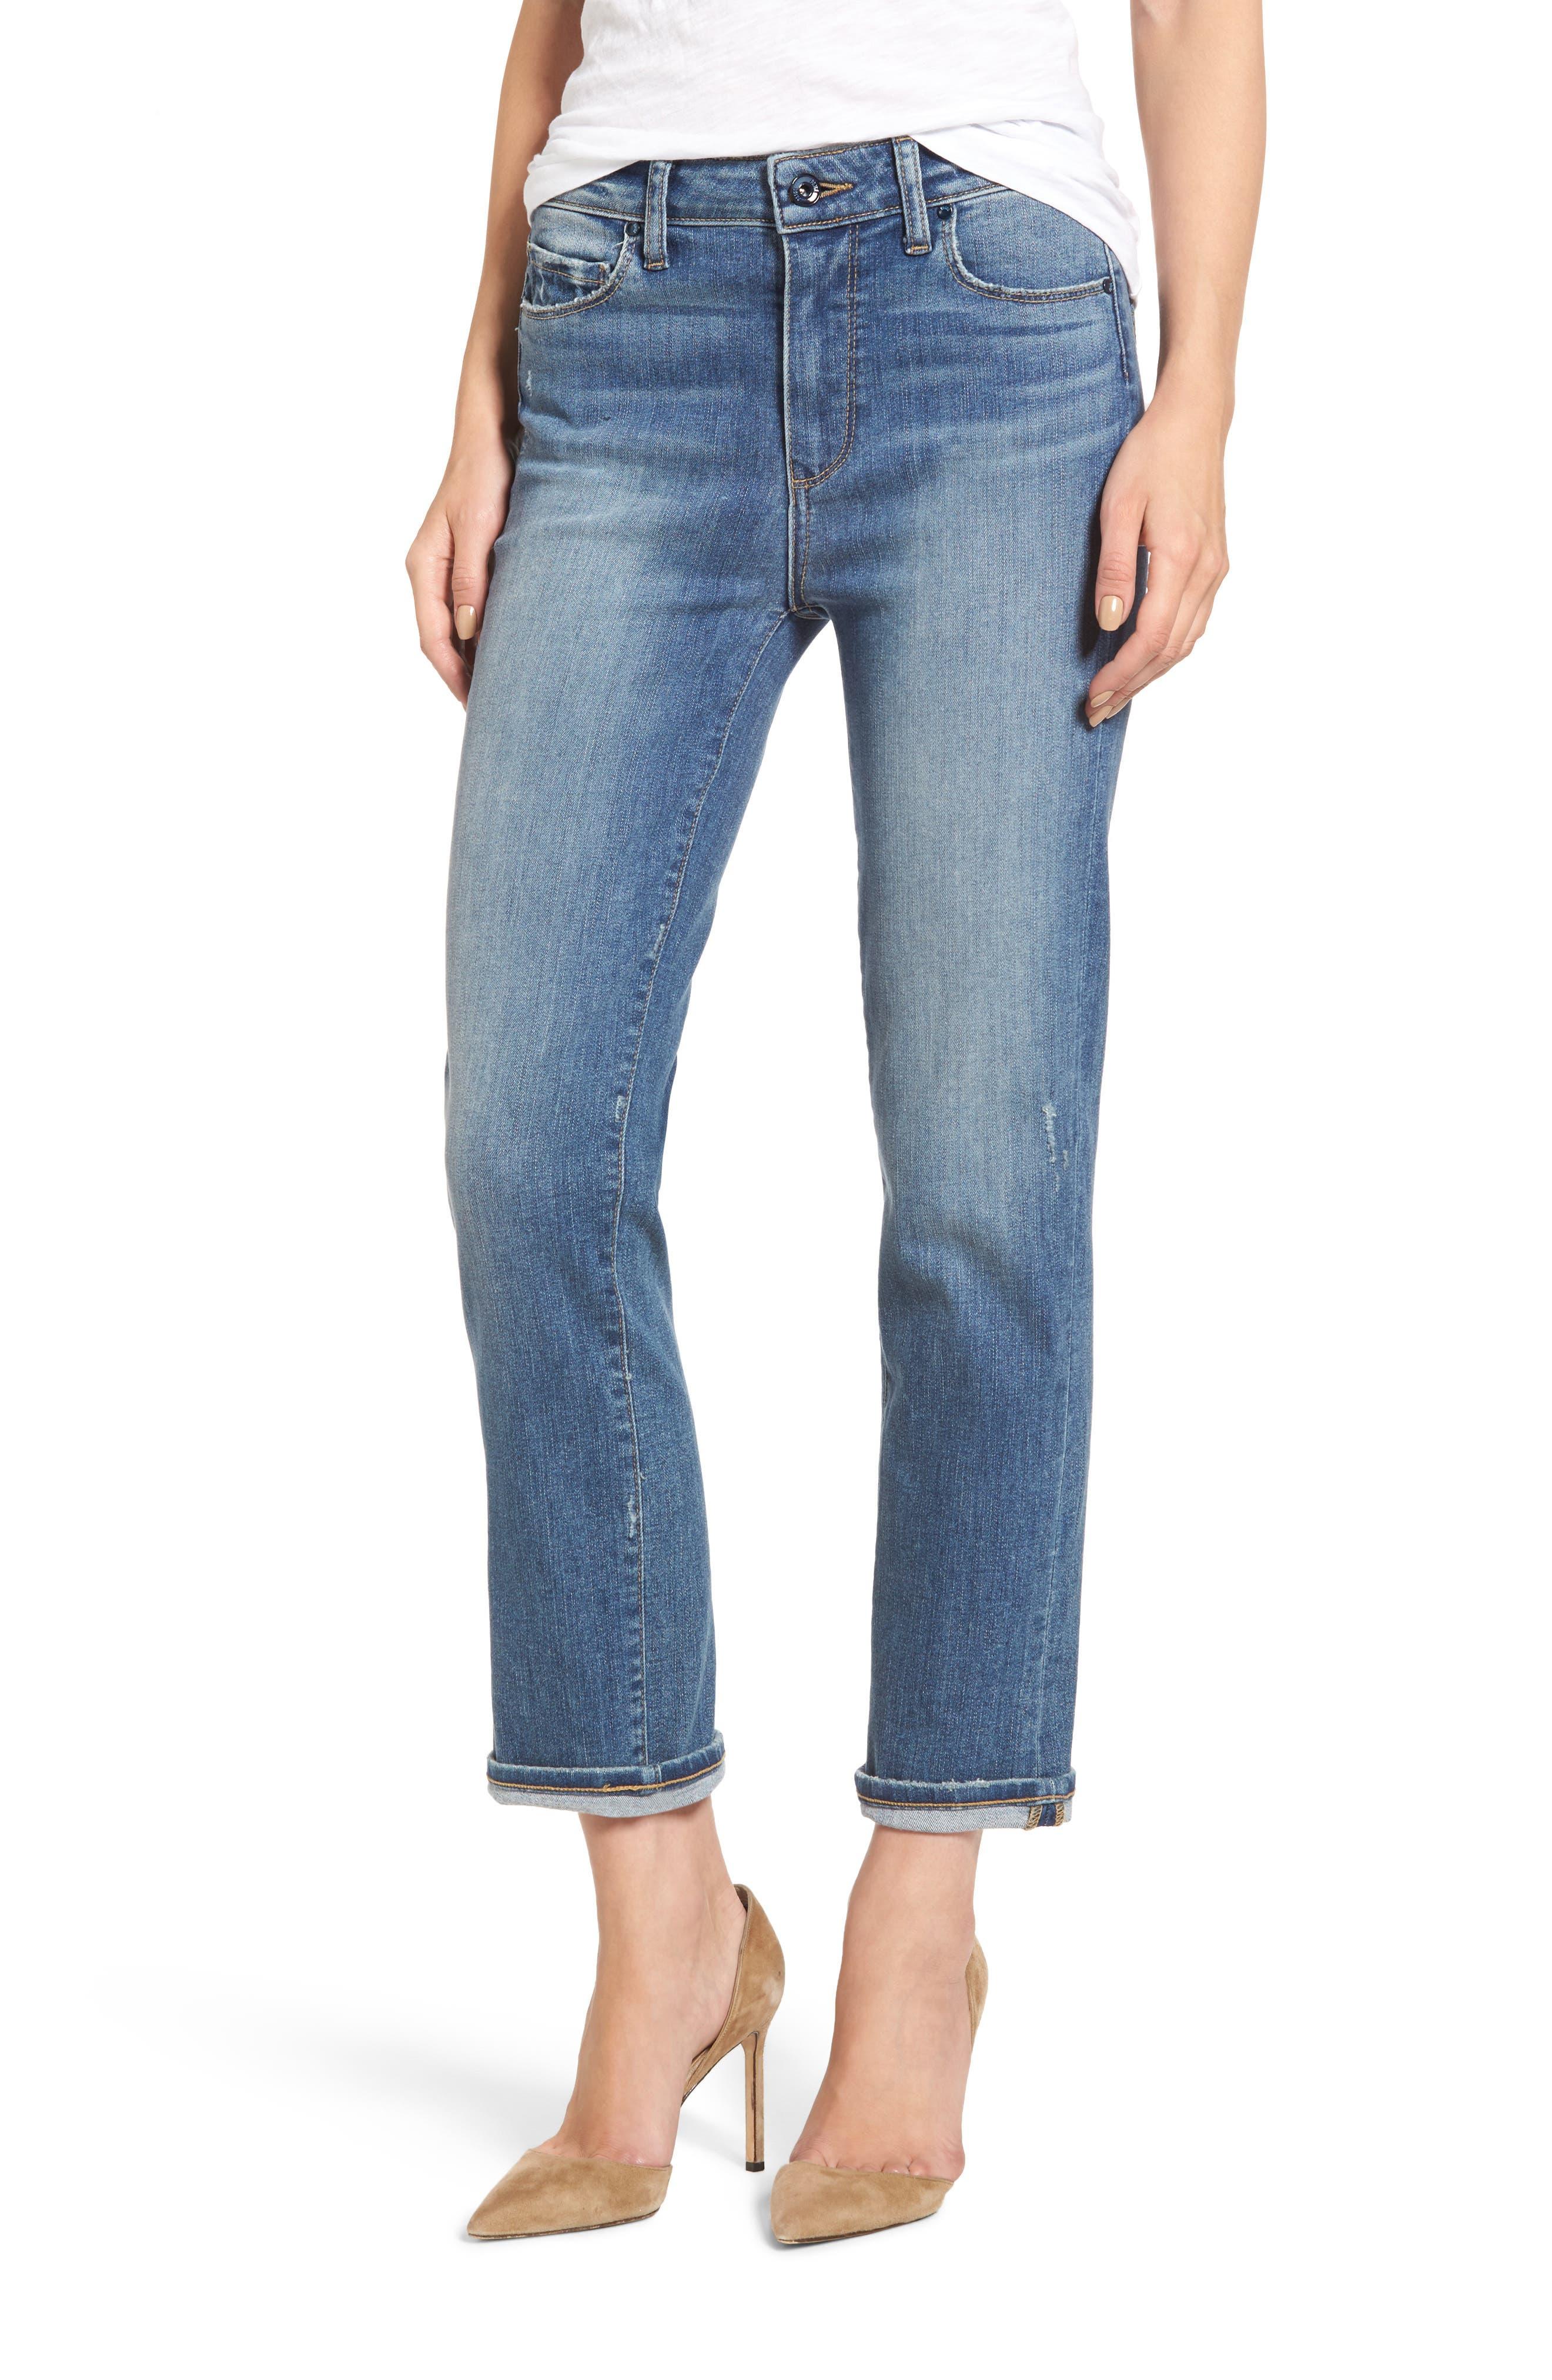 PAIGE Transcend Vintage - Jacqueline High Waist Ankle Straight Leg Jeans (Sienna)